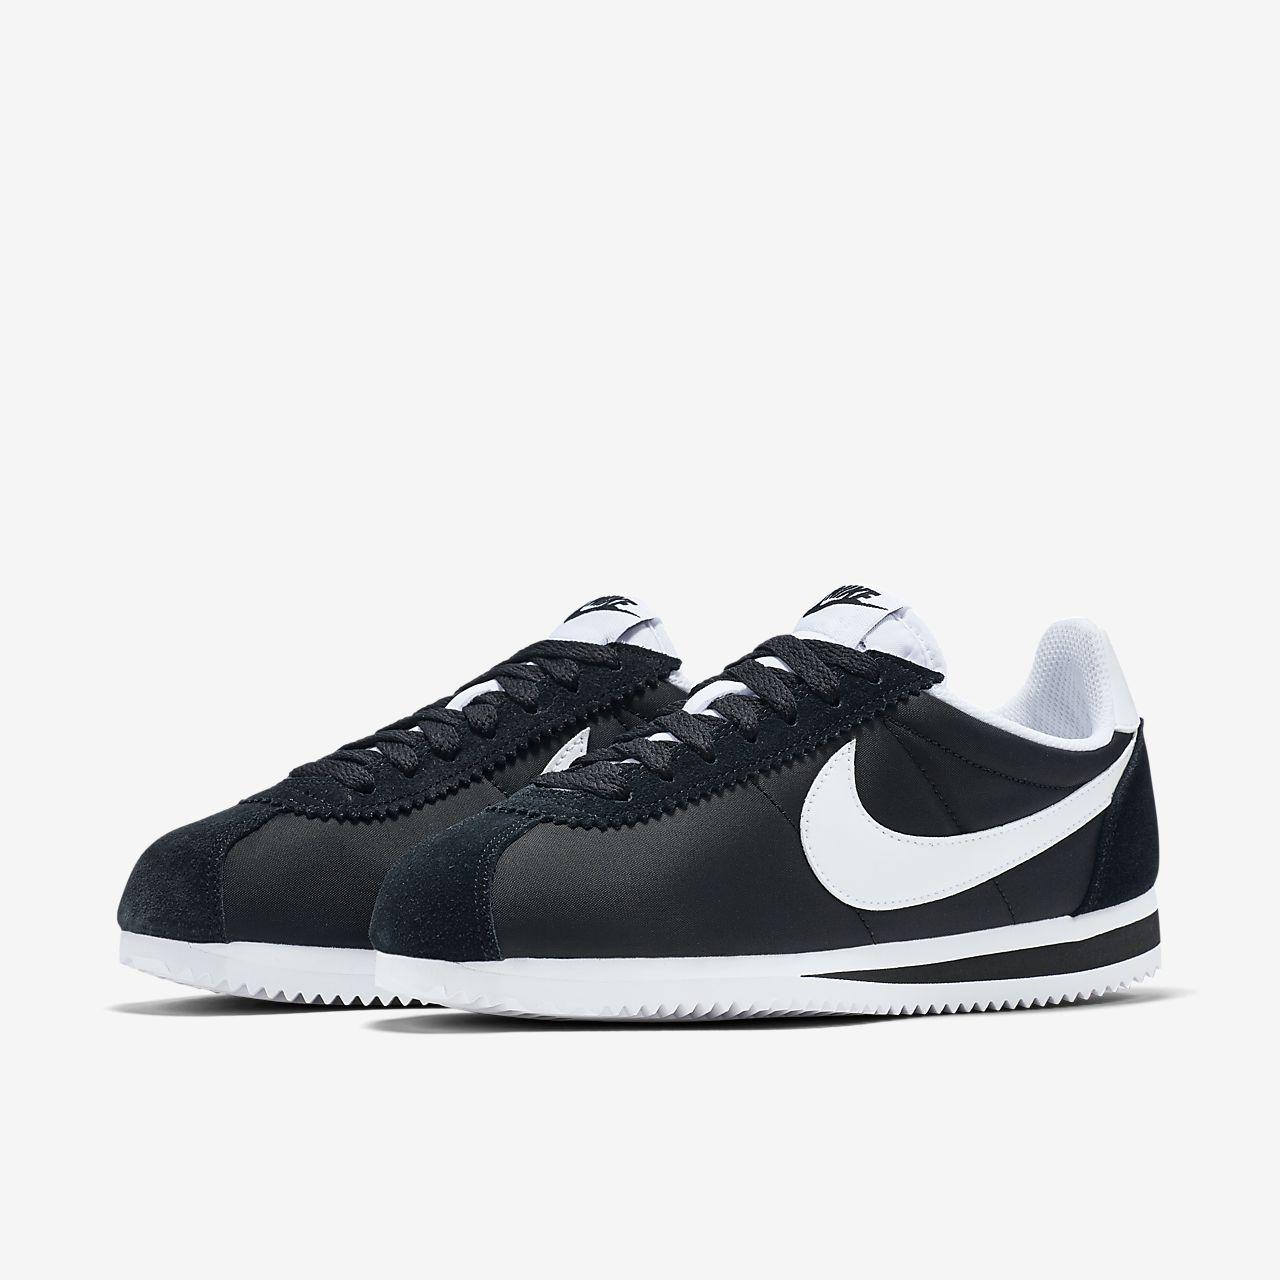 size 40 28a7f b8efb Nike Classic Cortez Nylon Women's Shoe